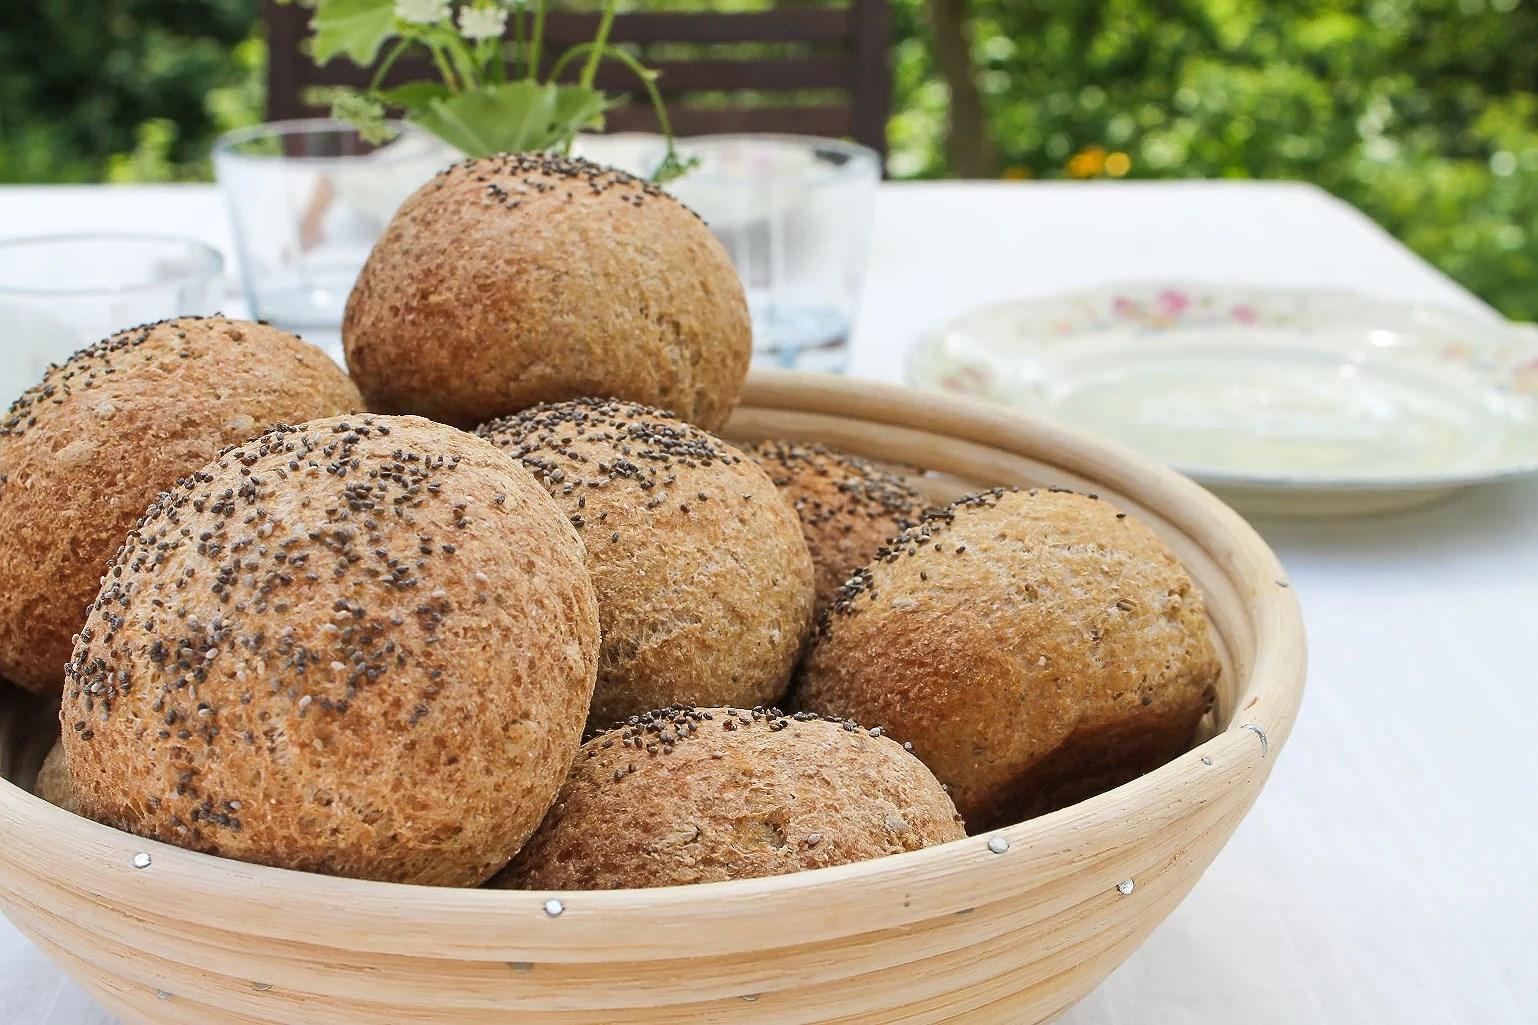 Verdens (måske) bedste glutenfri havreboller